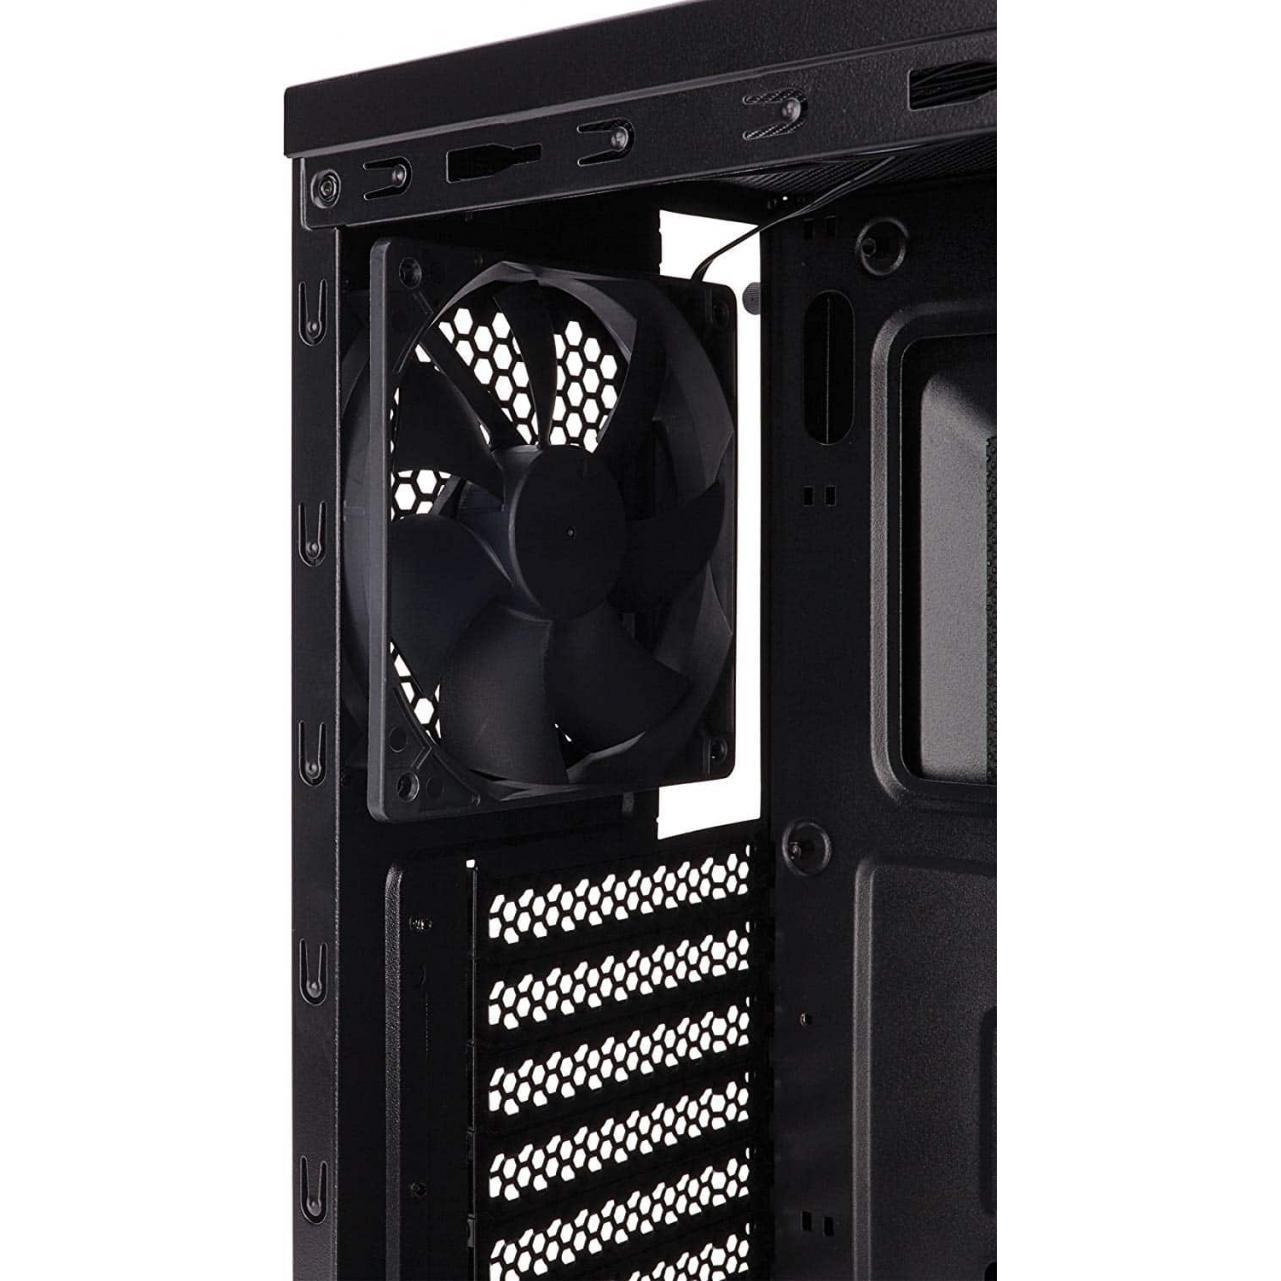 Corsair Carbide Series 100R Silent Edition Quiet Mid Tower Case